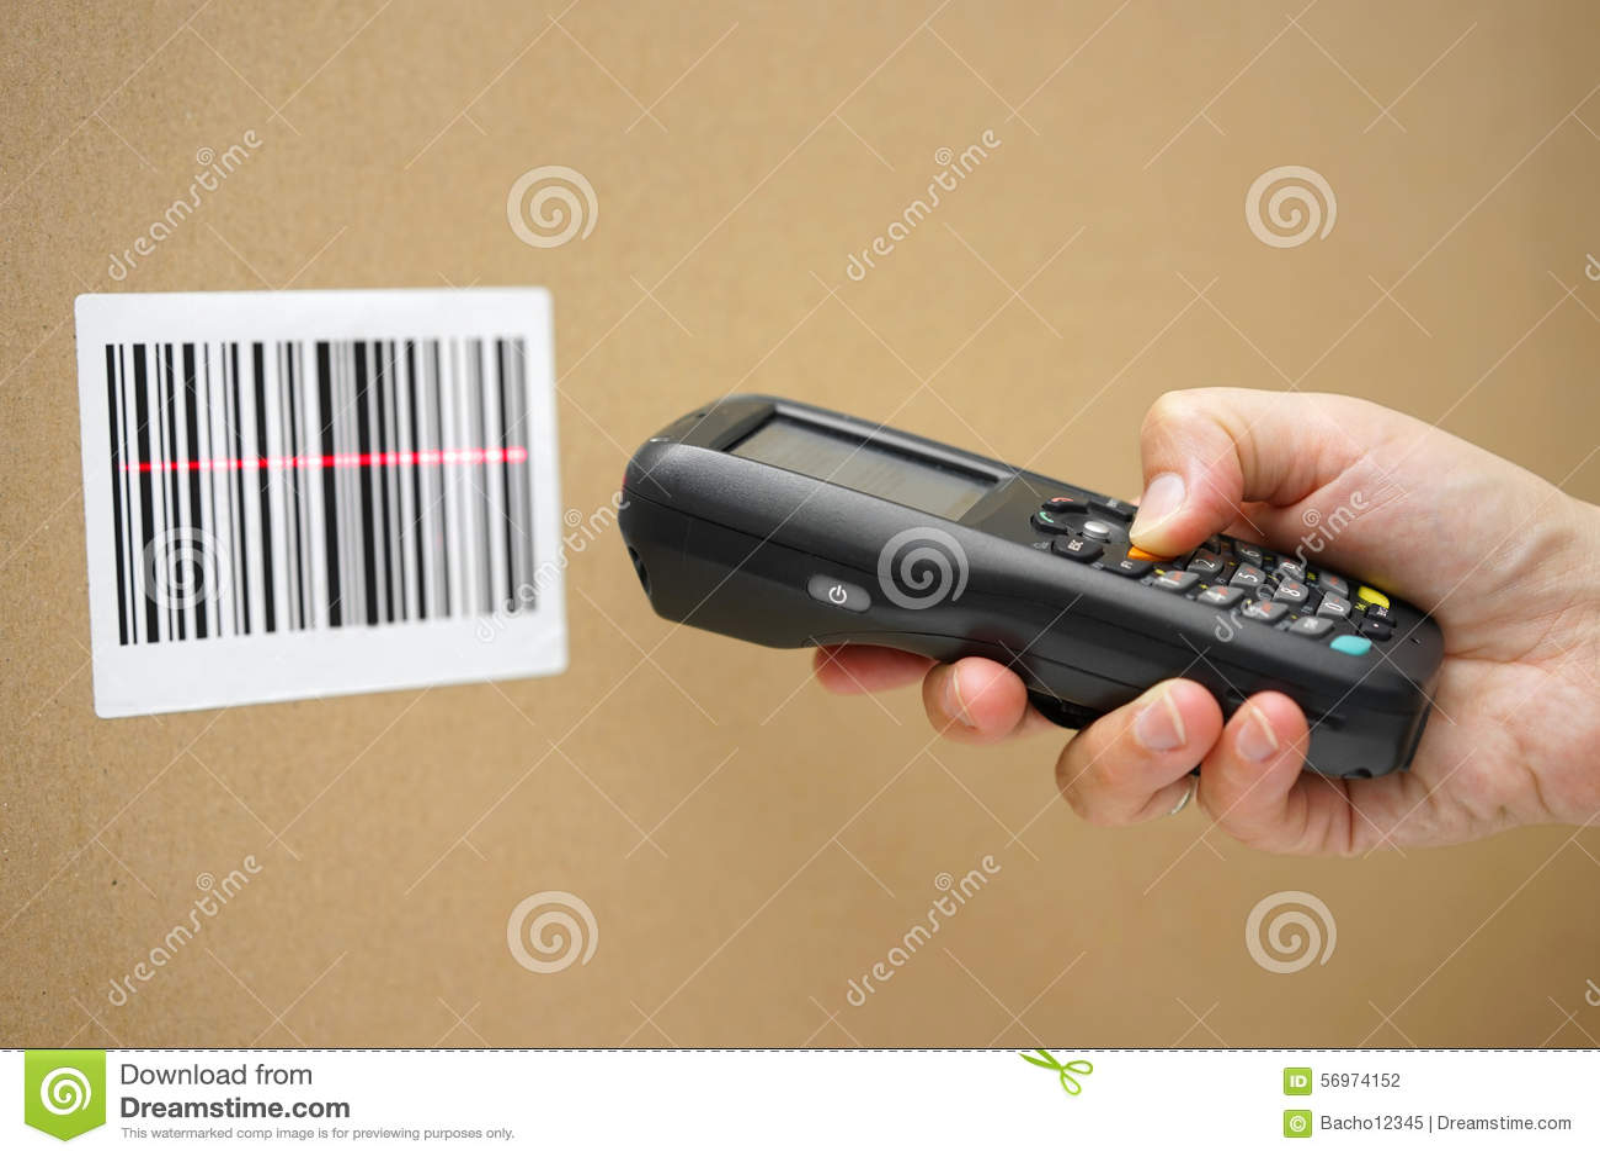 Barcode Scanner Clipart